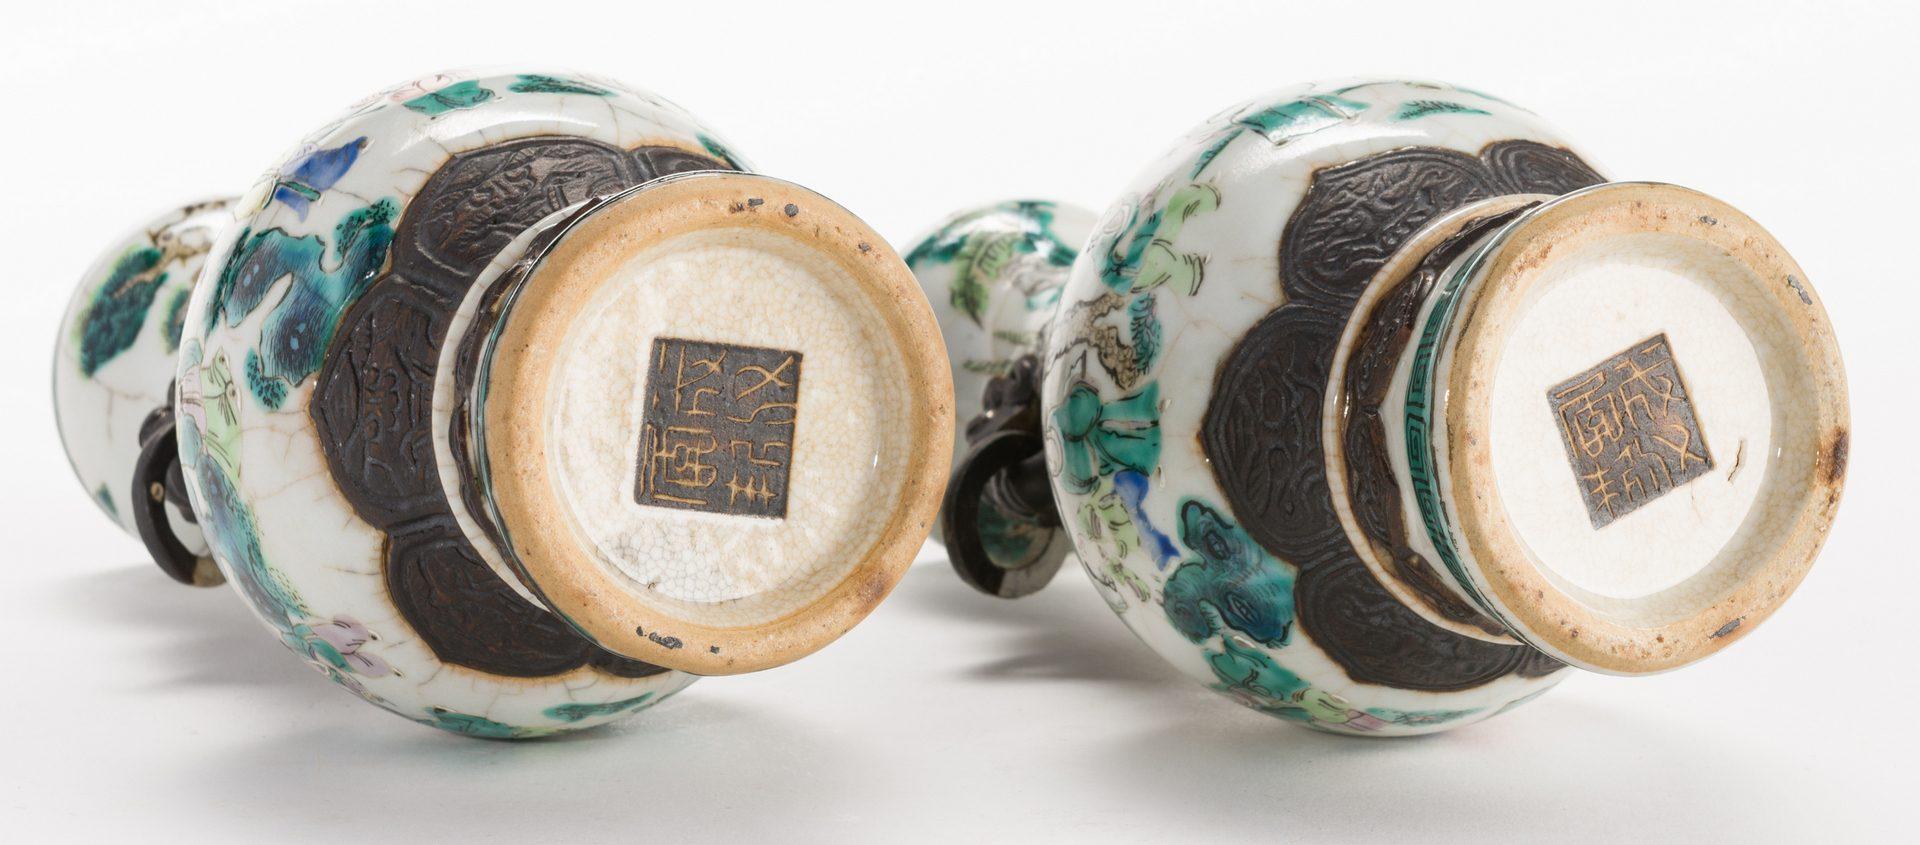 Lot 23: Pr. Chinese Famille Verte Crackleware Vases